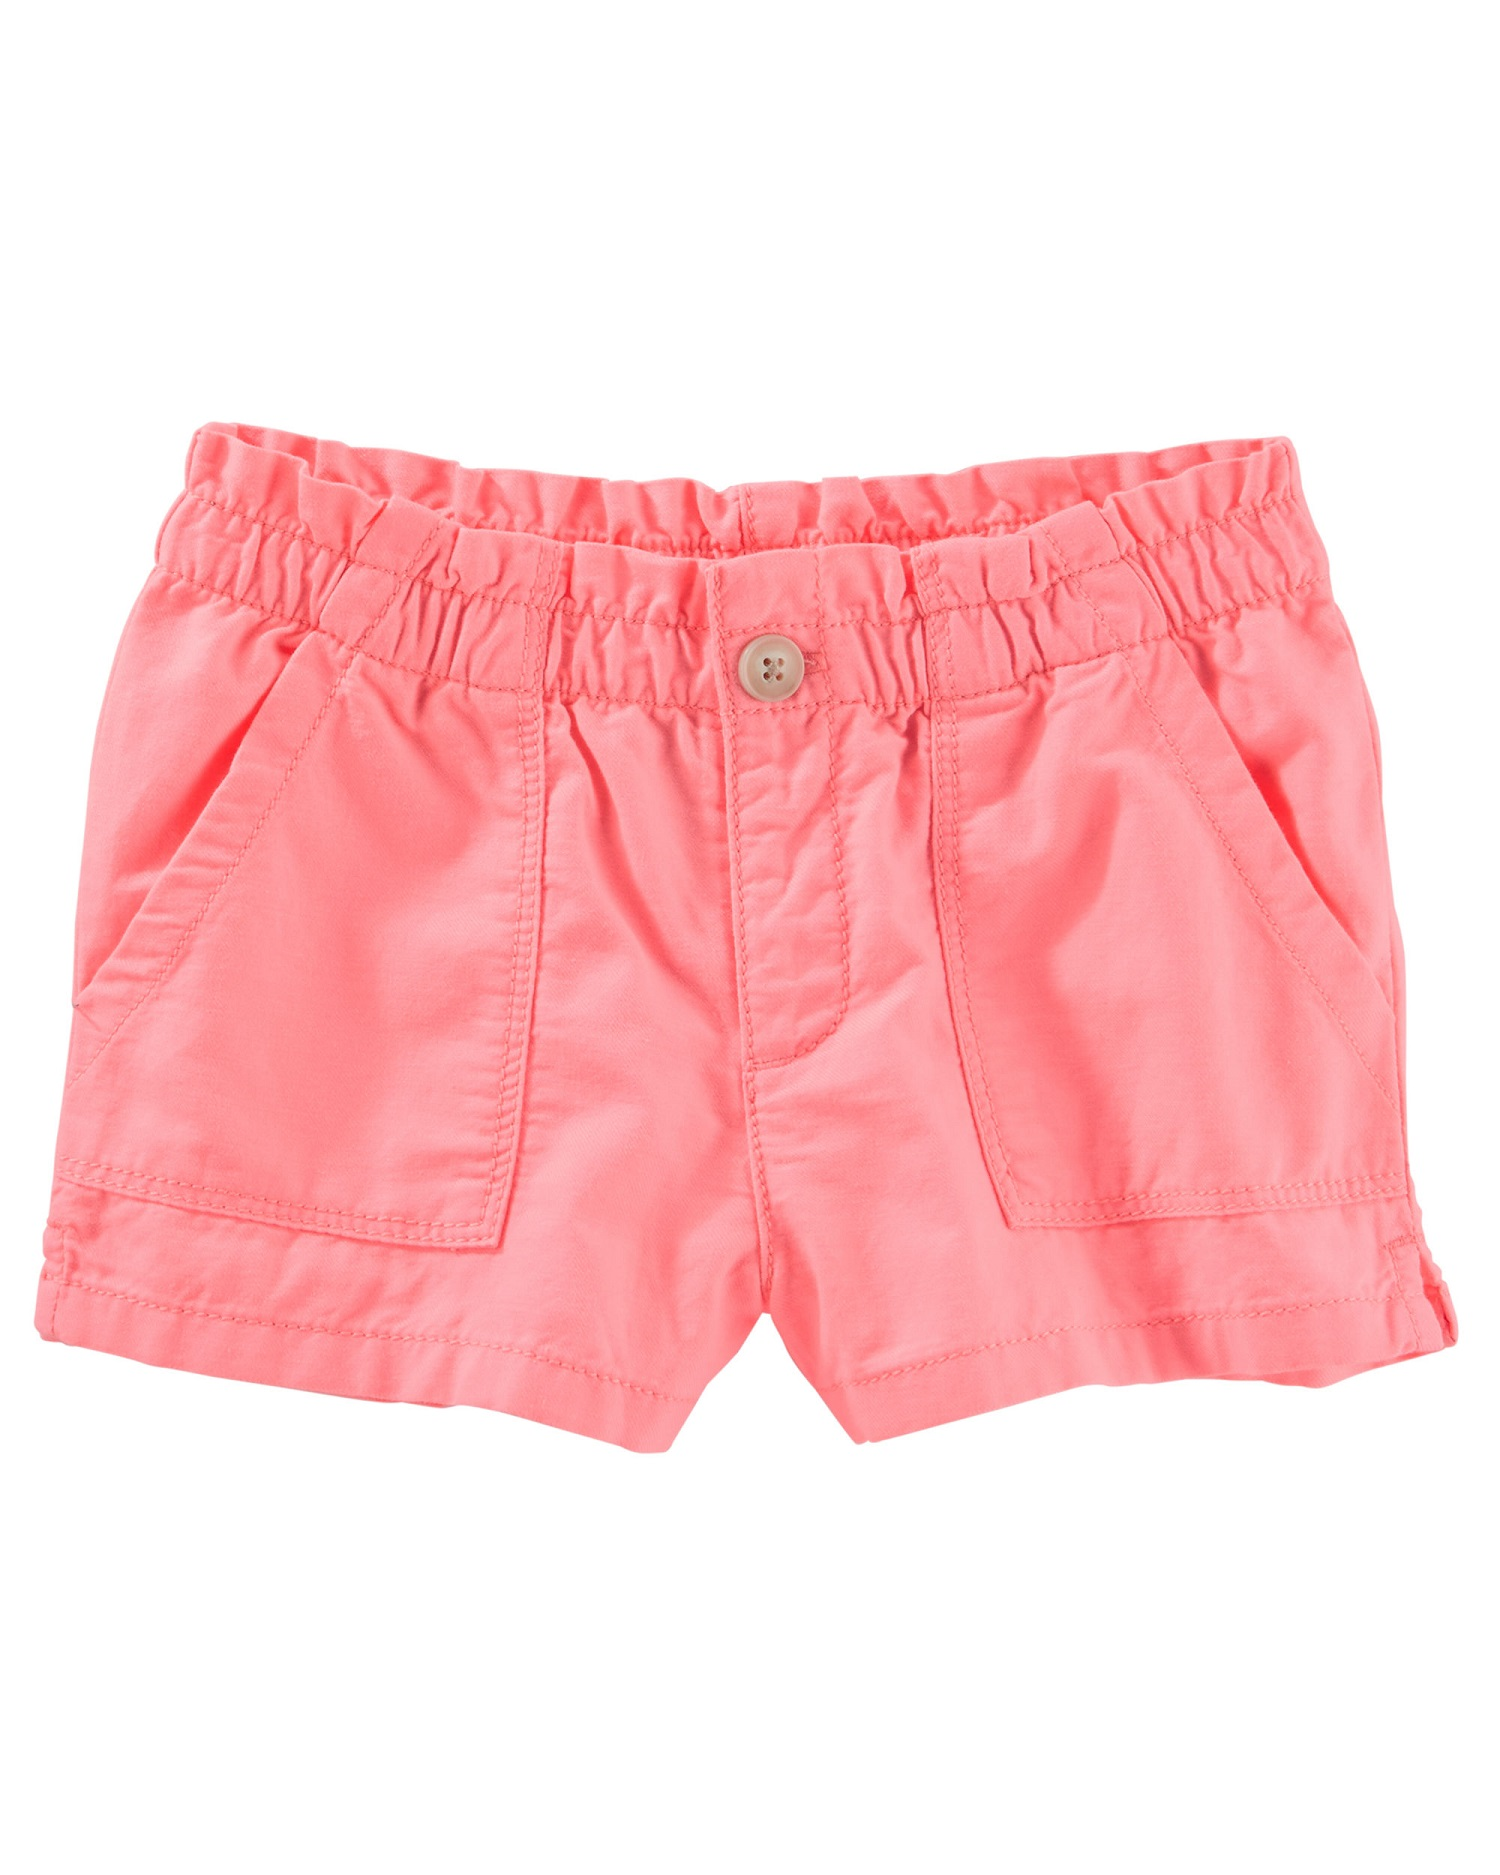 OshKosh B'gosh Big Girls' Beach Shorts, 14 Kids